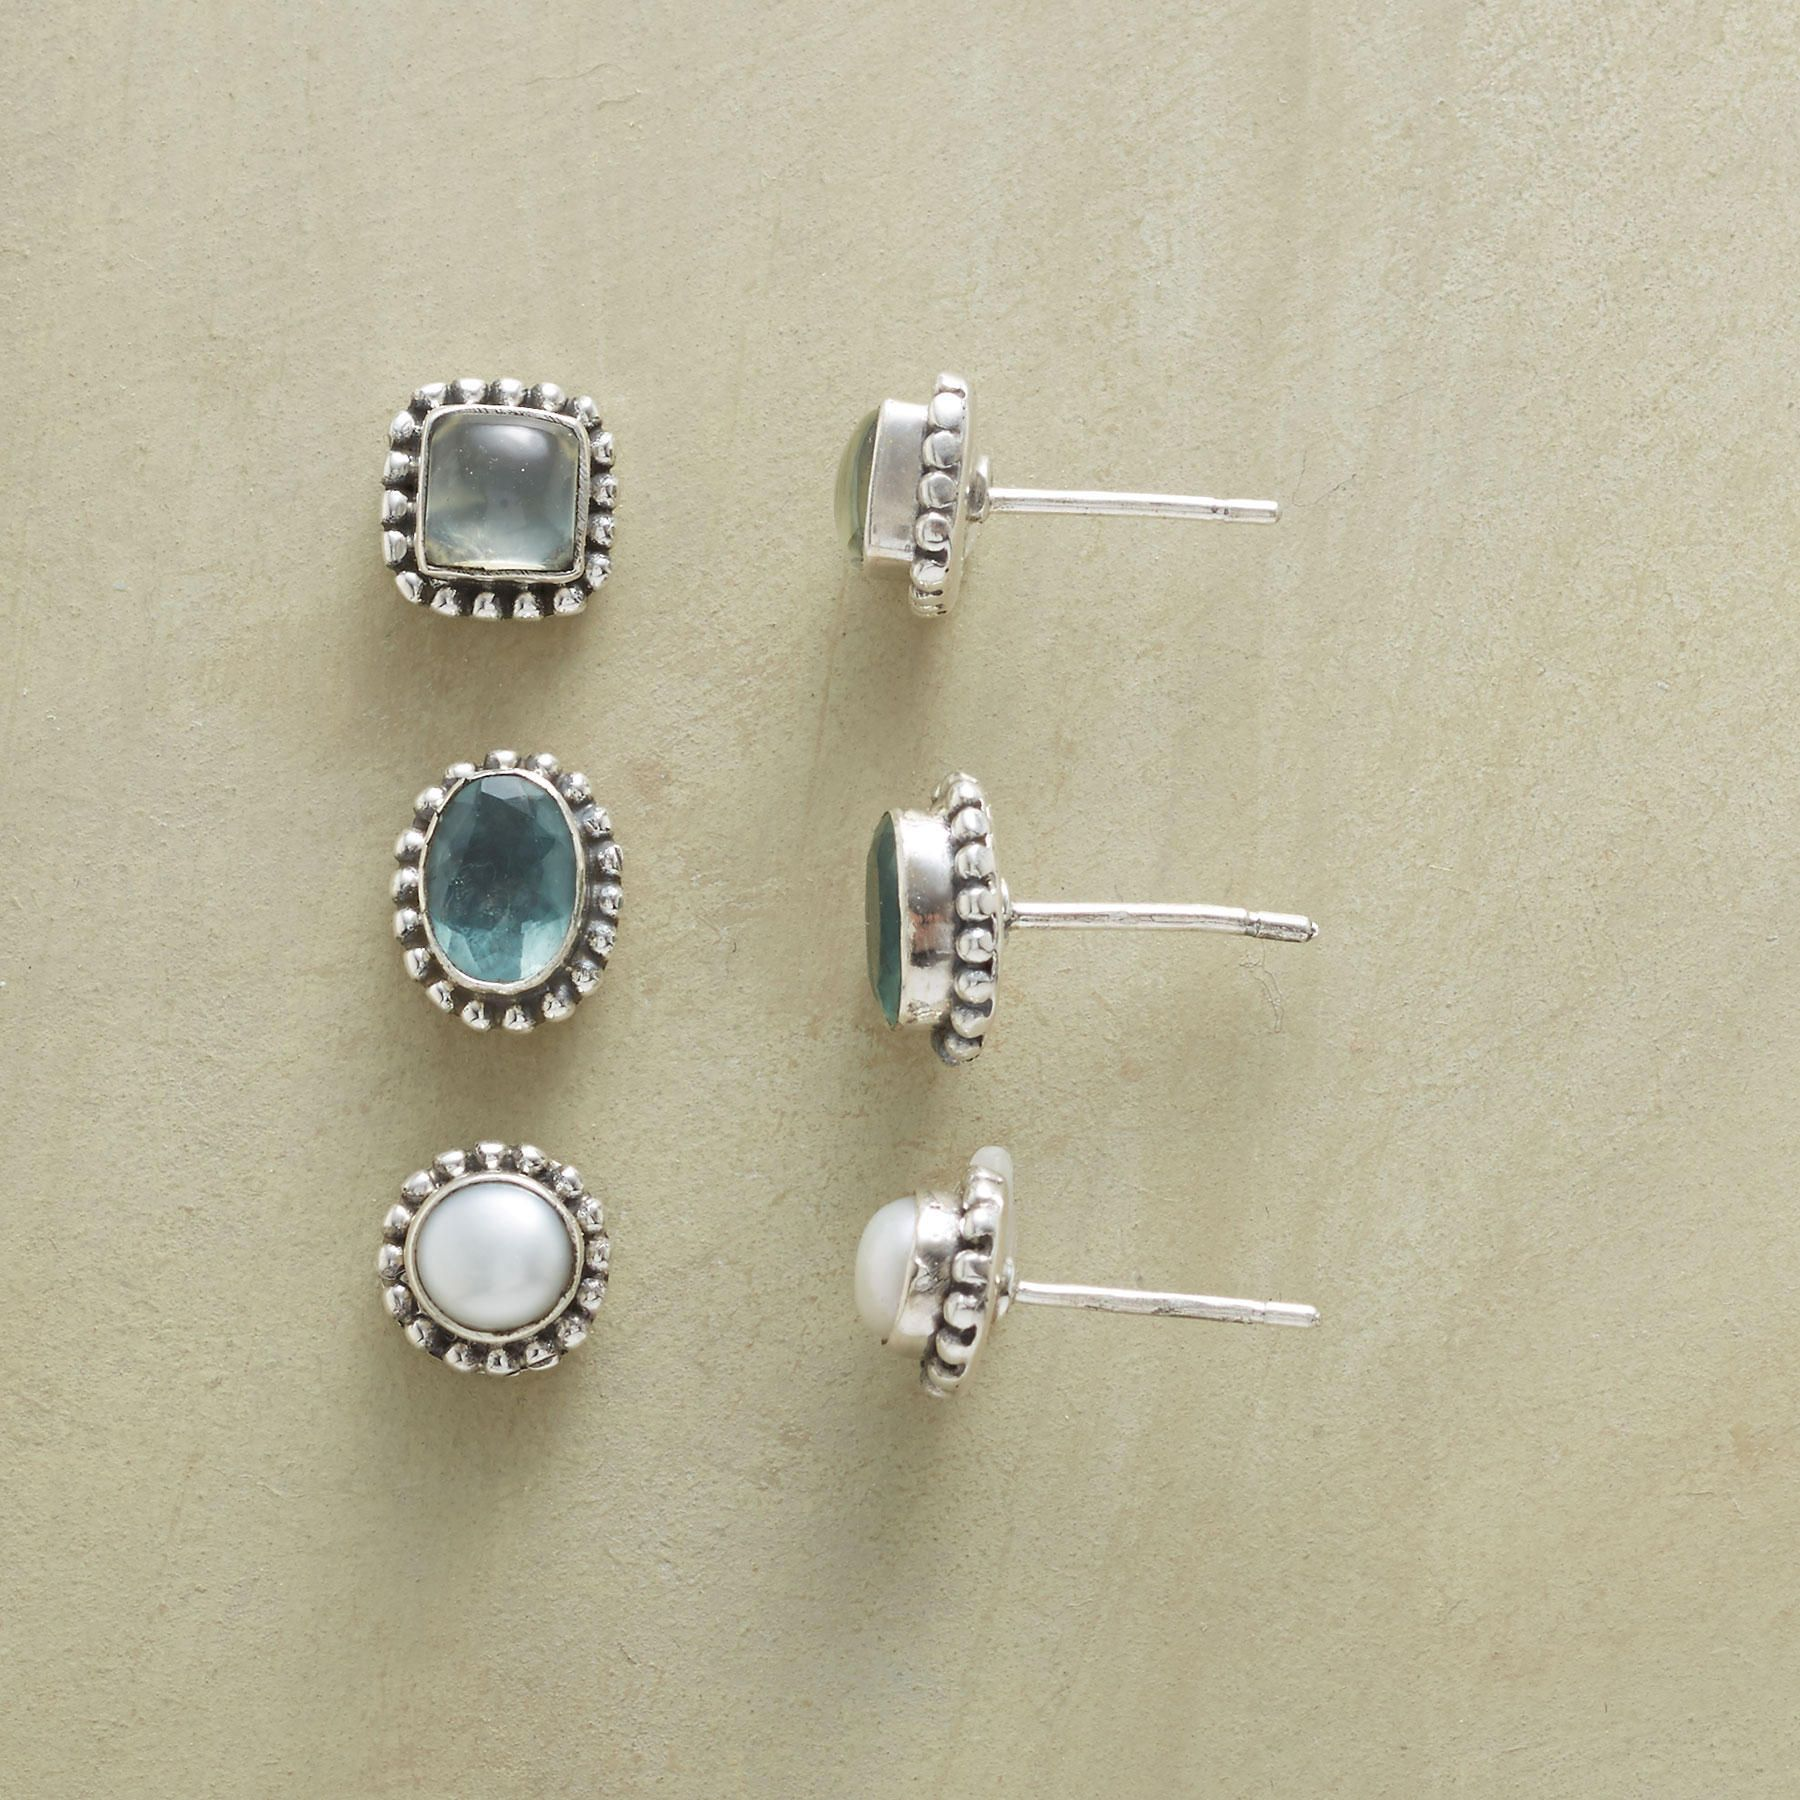 Best Designer Jewelry Sterling Silver 1.35mm 8 Side Diamond Cut Box Chain